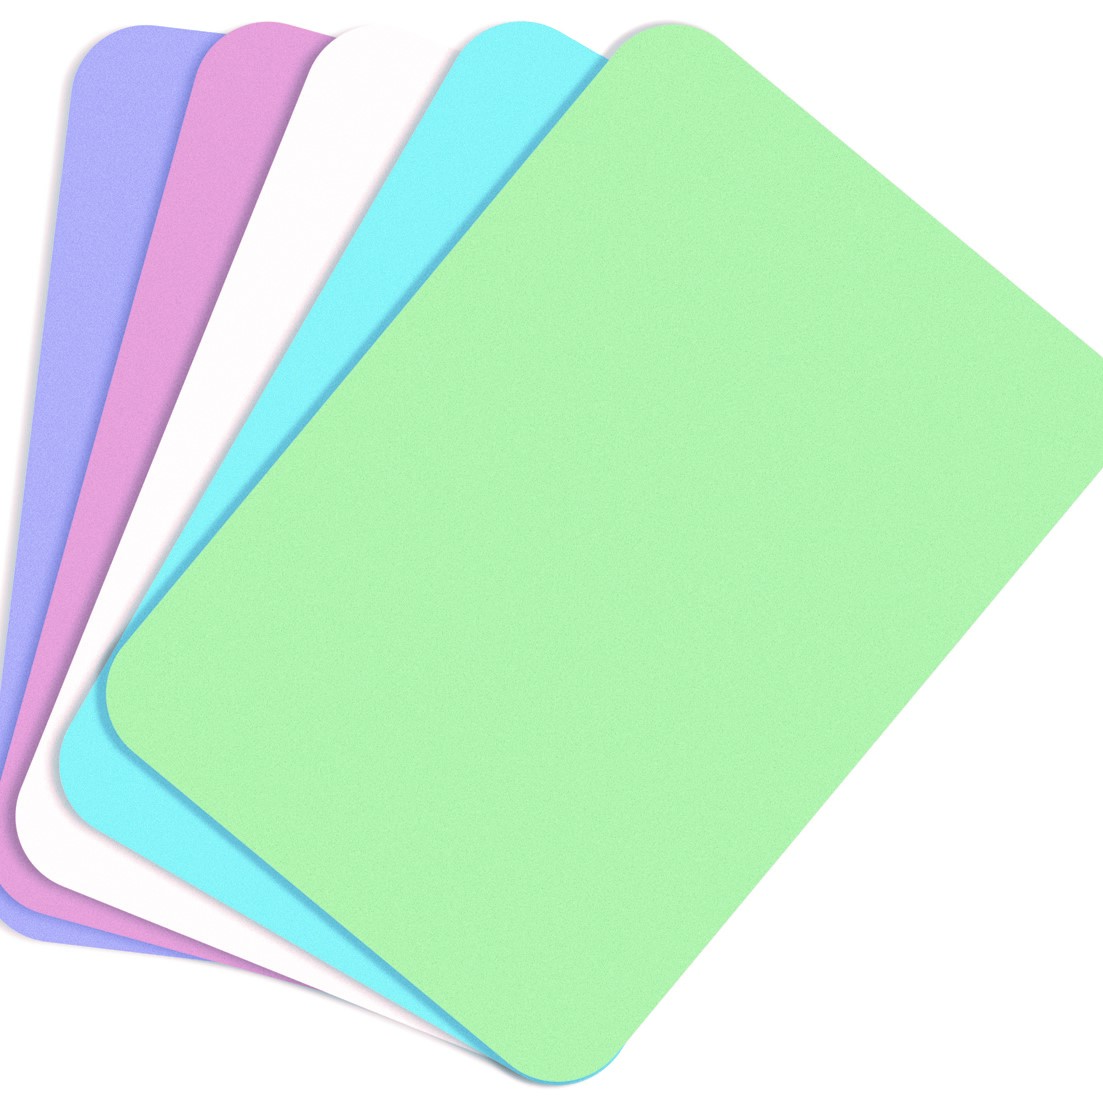 Tray Covers - Paper 1000 per box